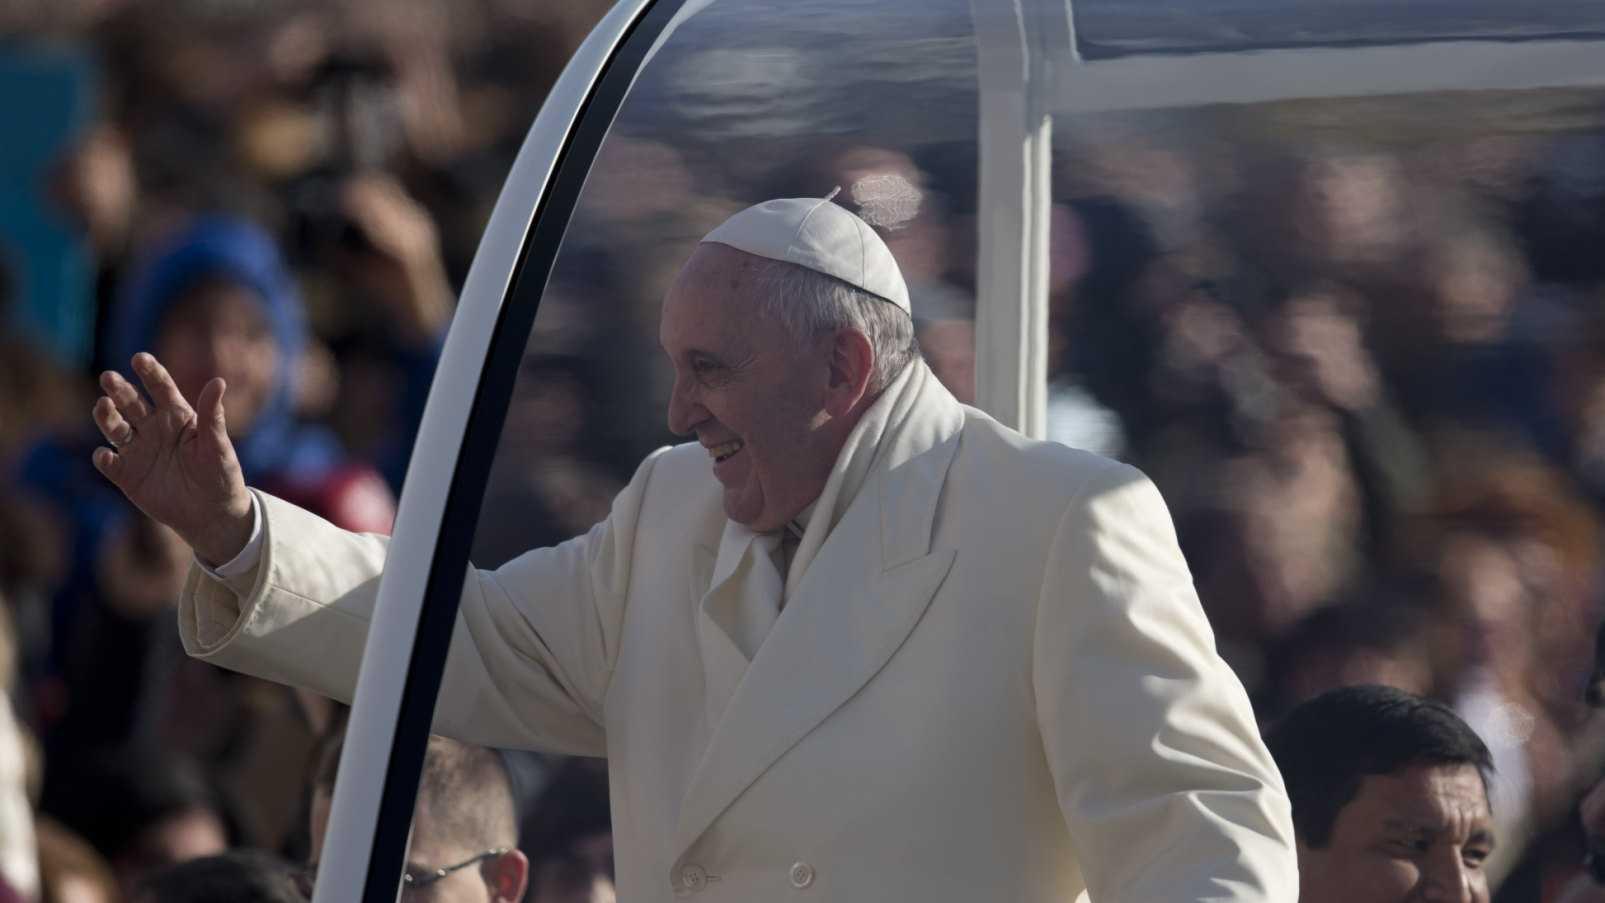 Pope Francis Popemobile 010814 AP.jpg